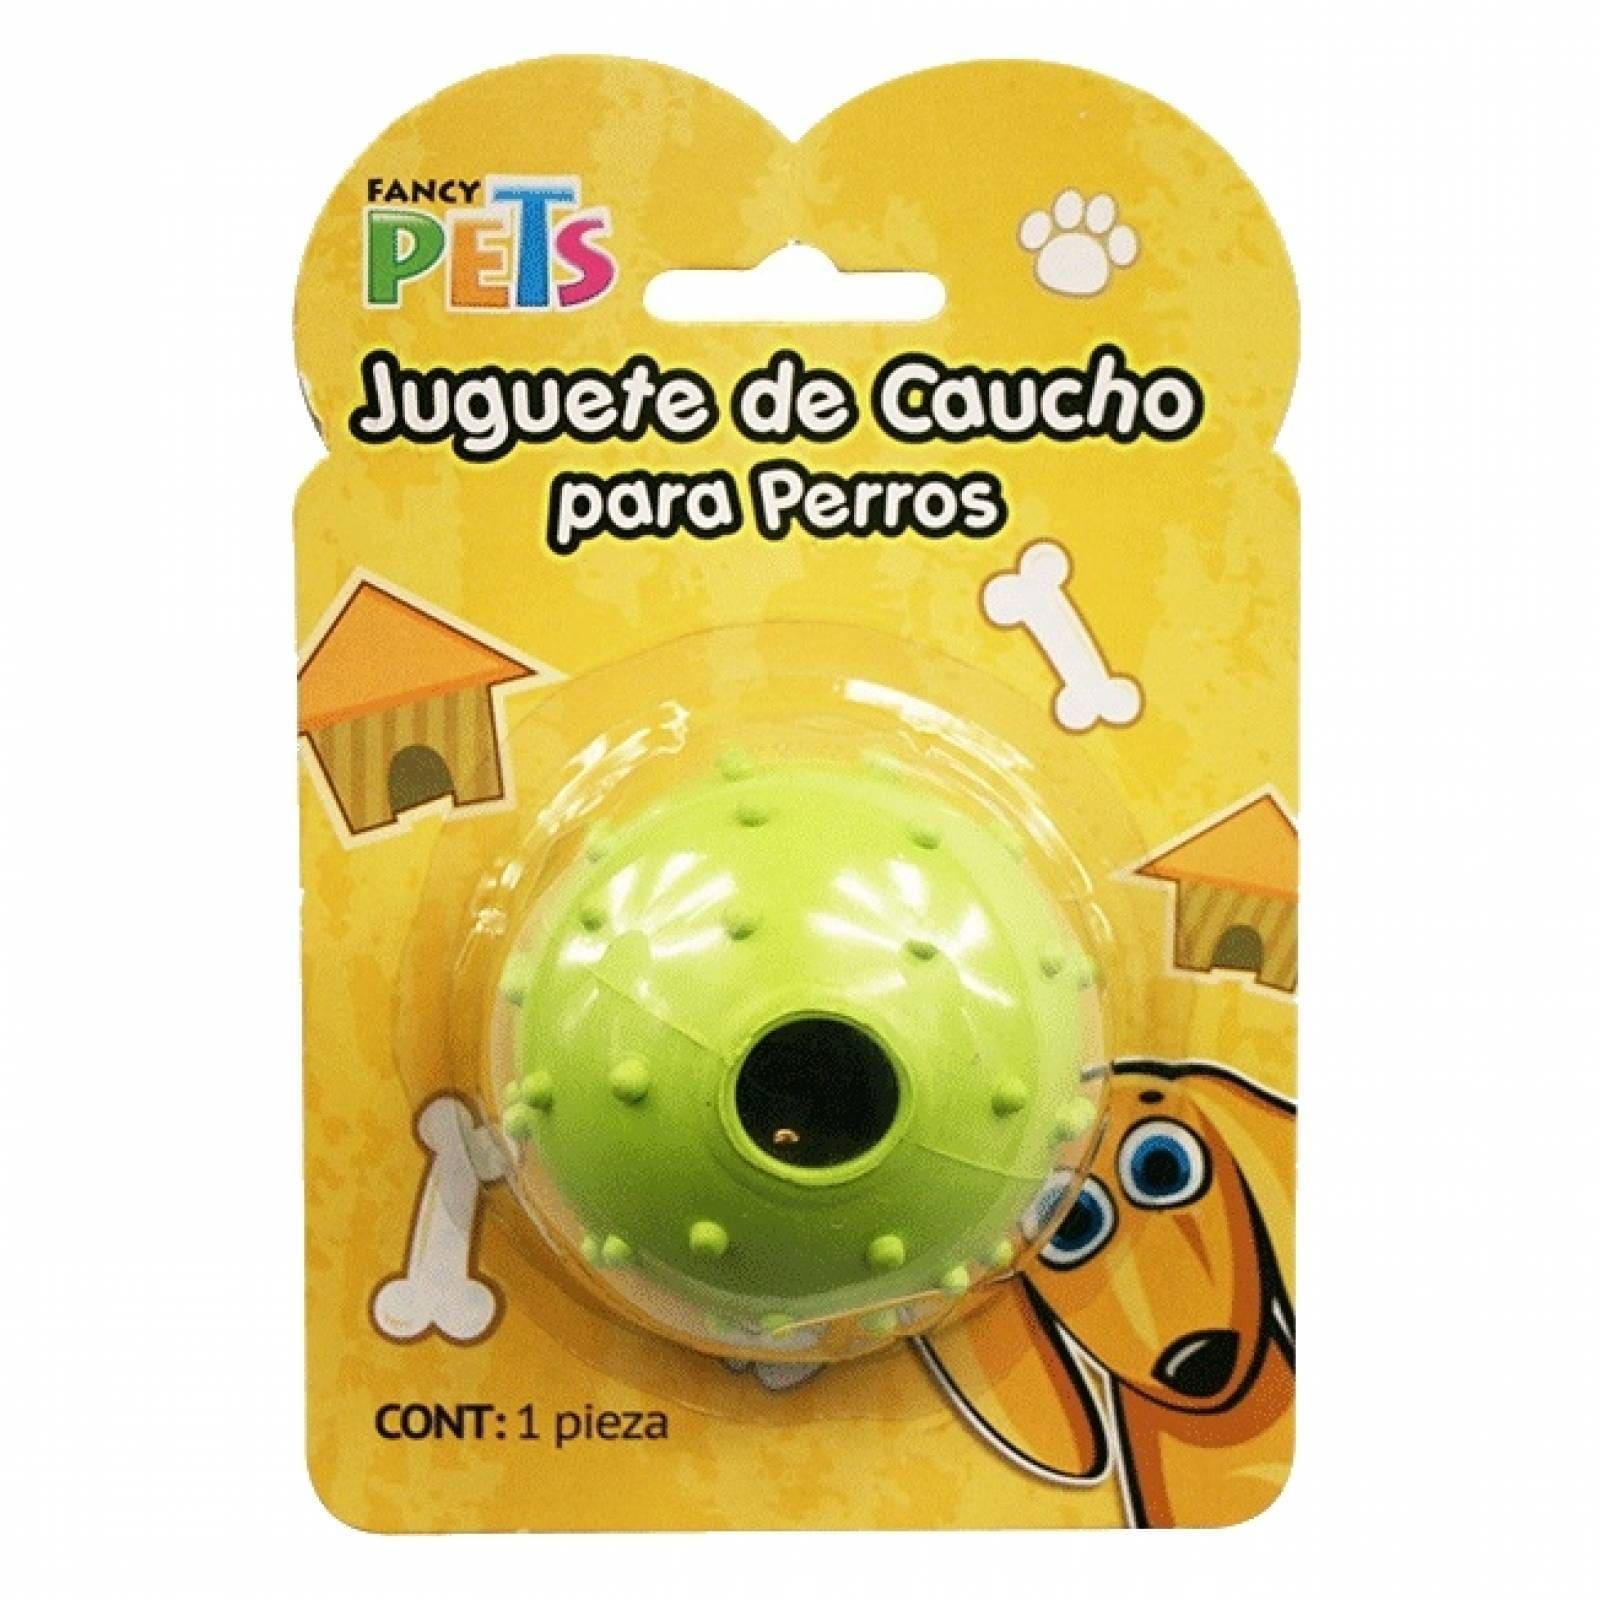 JUGUETE CAUCHO TEXTURA BOLA CASCABEL 6,5 cm PERRO FANCY PETS